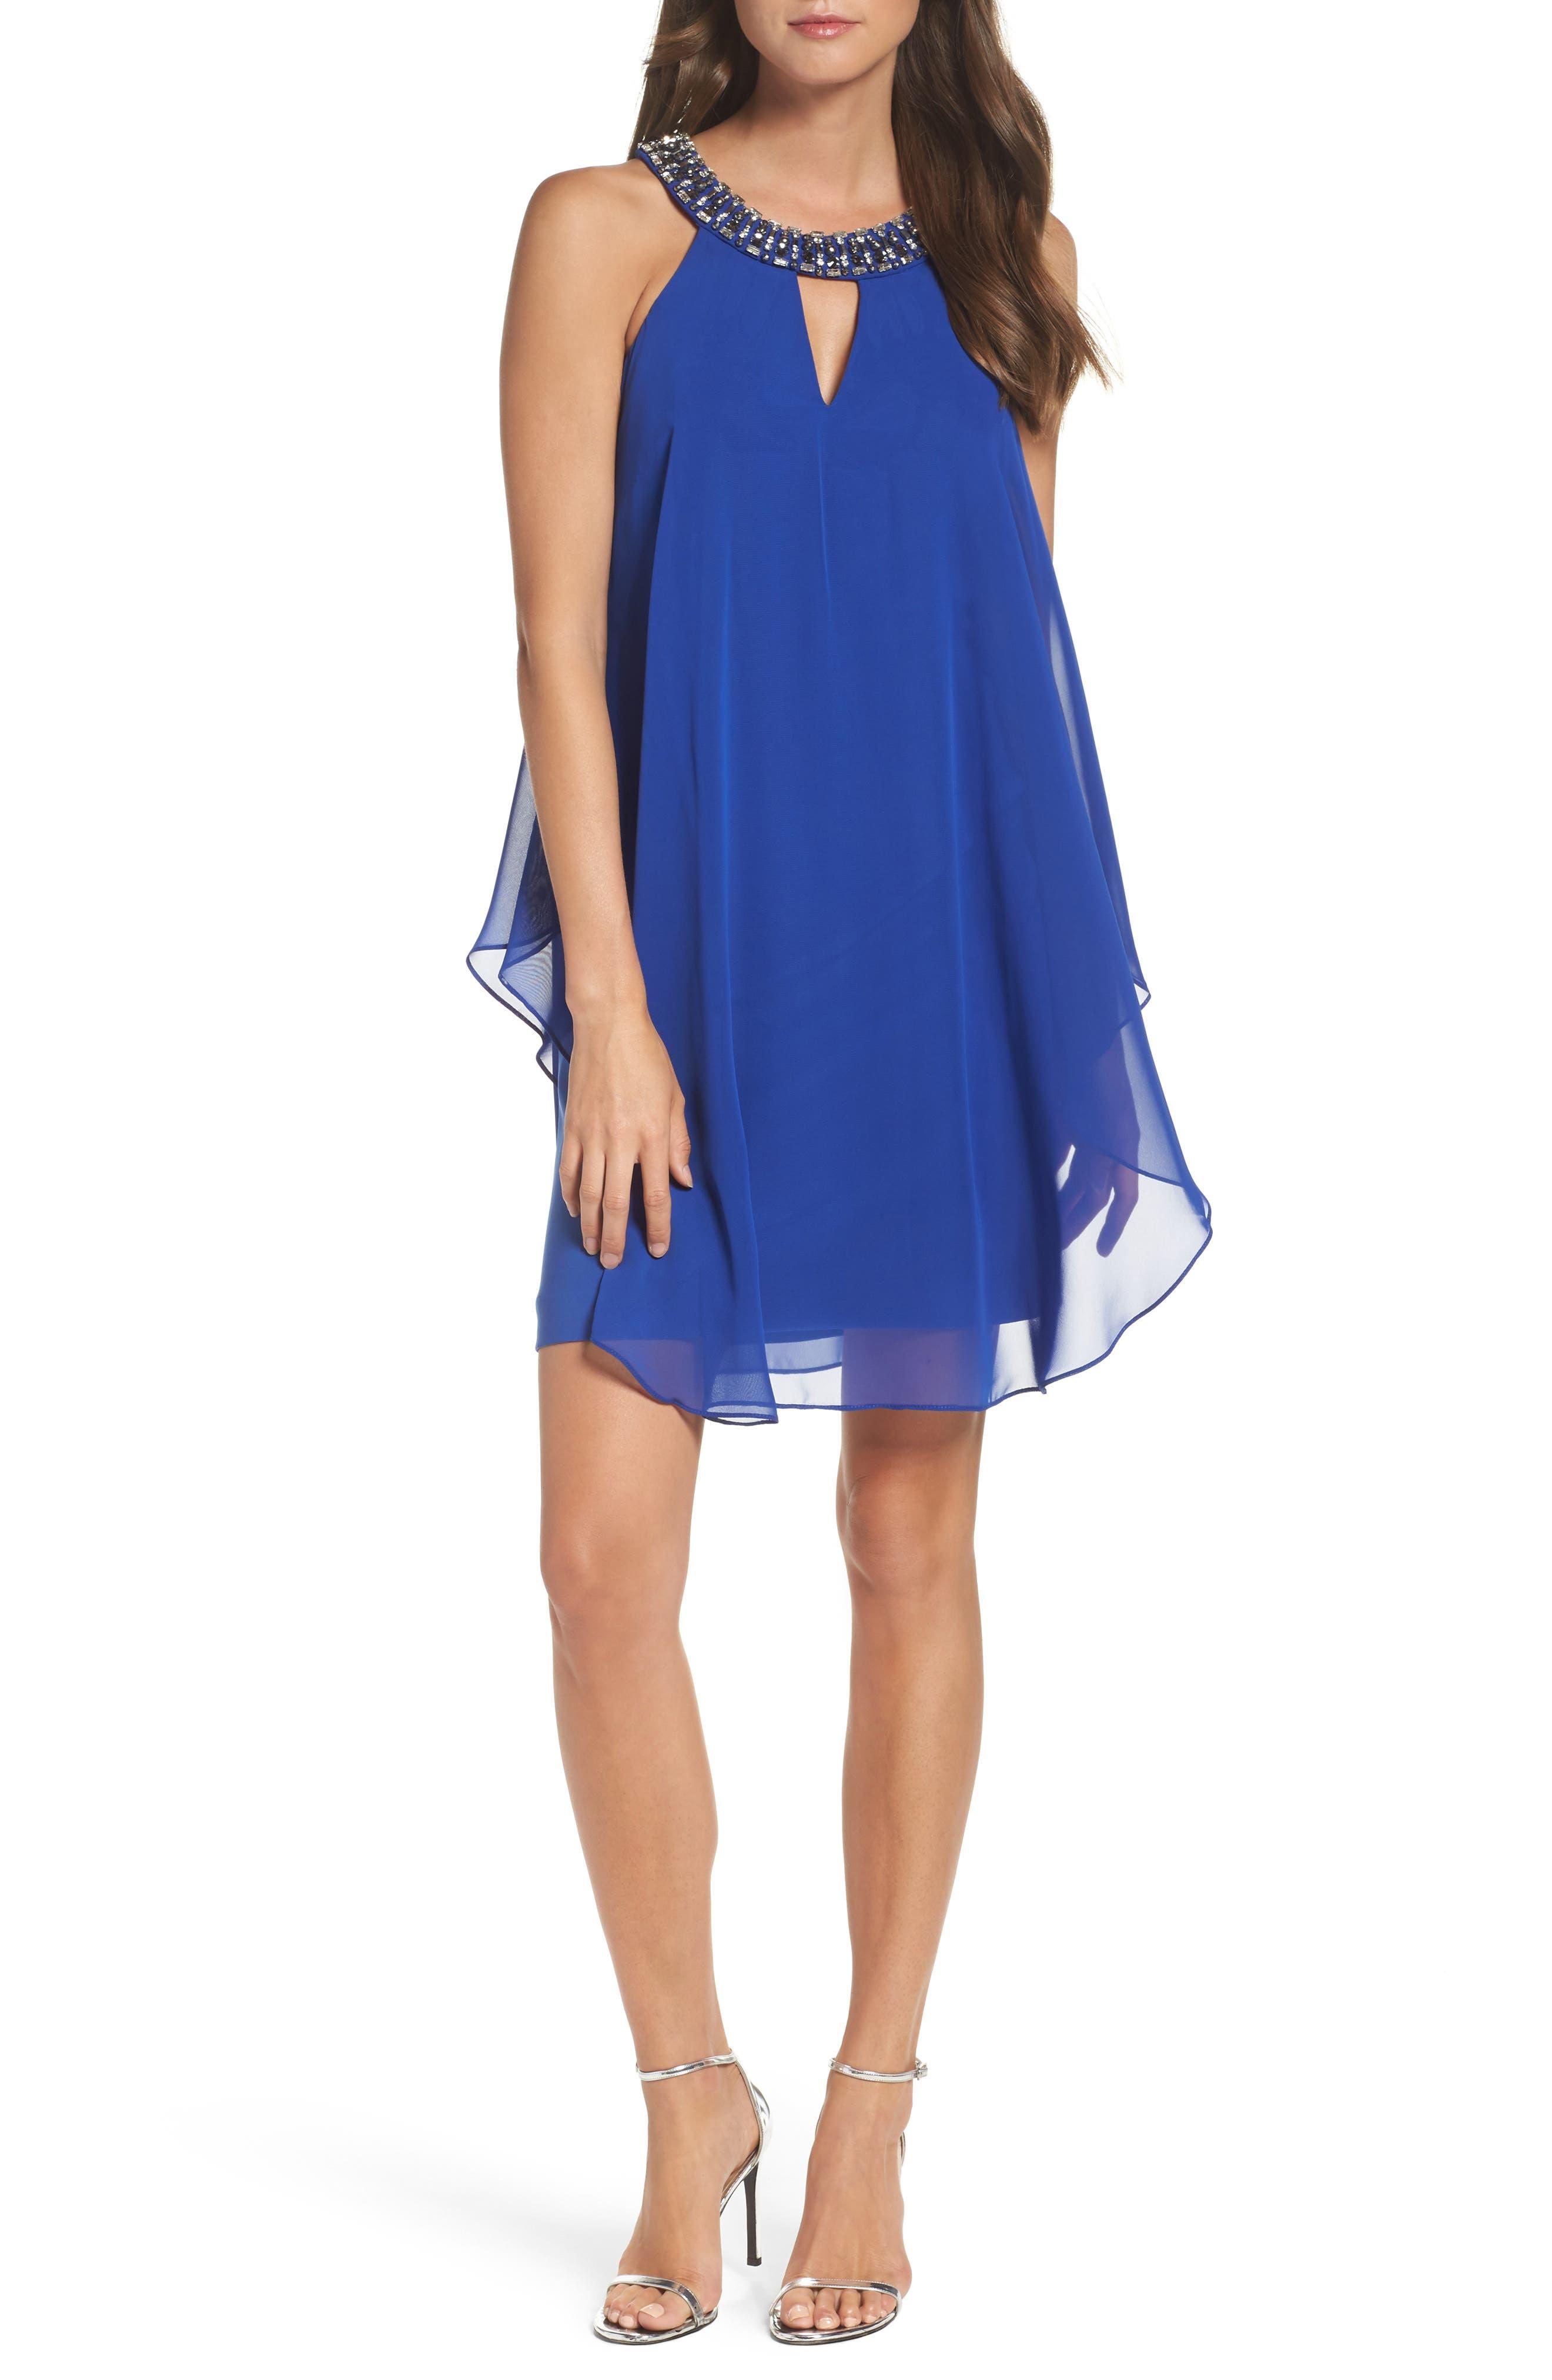 Alternate Image 1 Selected - Vince Camuto Embellished Trapeze Dress